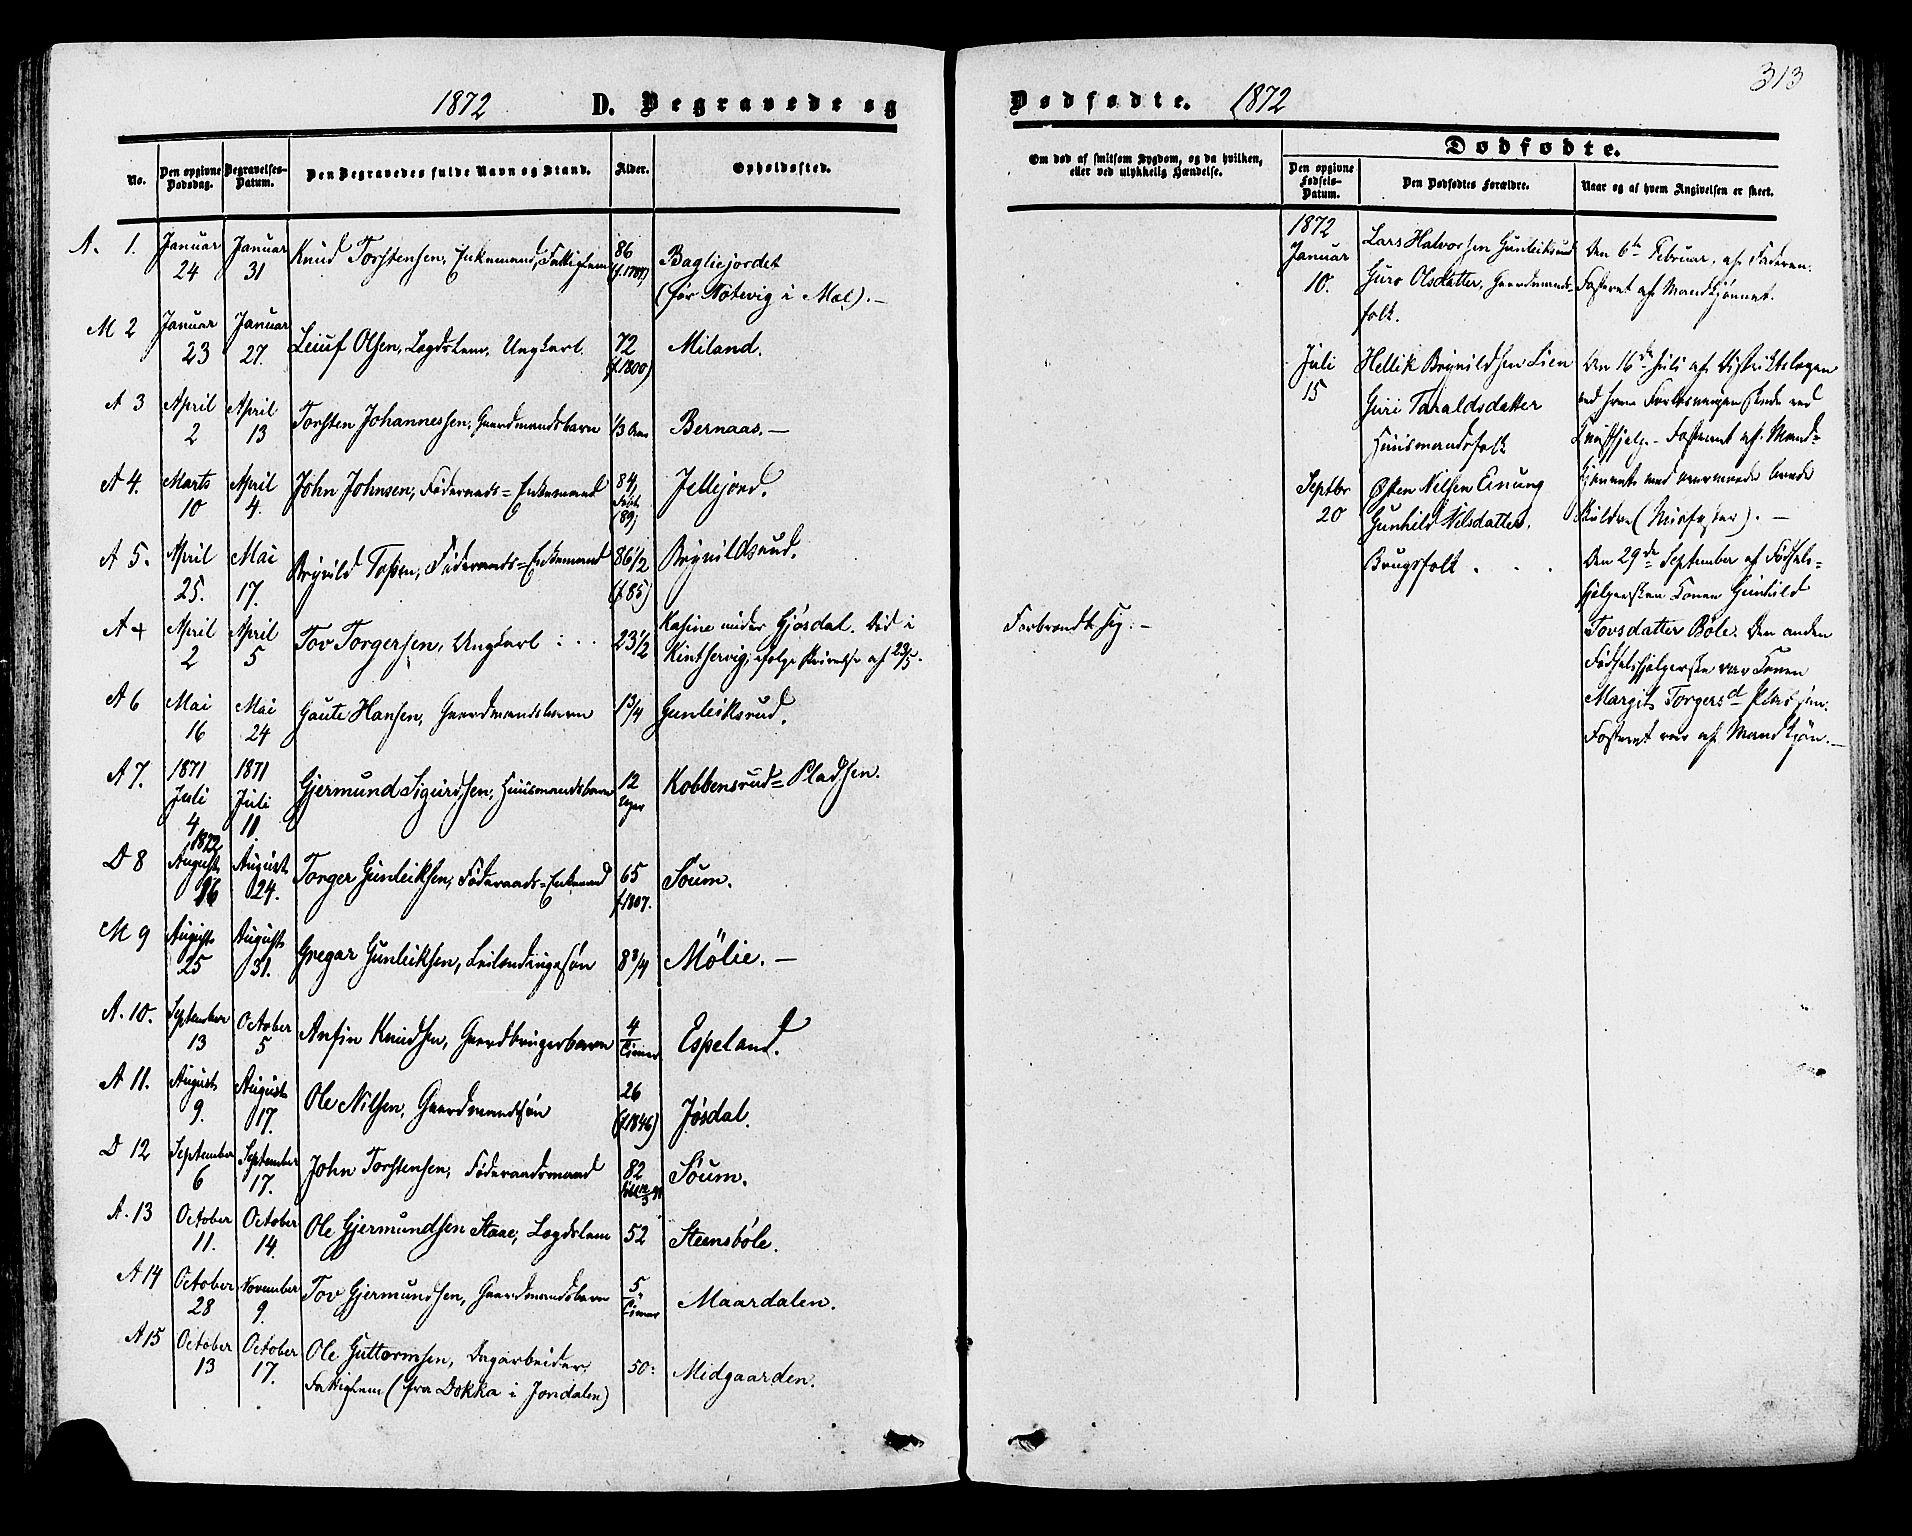 SAKO, Tinn kirkebøker, F/Fa/L0006: Ministerialbok nr. I 6, 1857-1878, s. 313